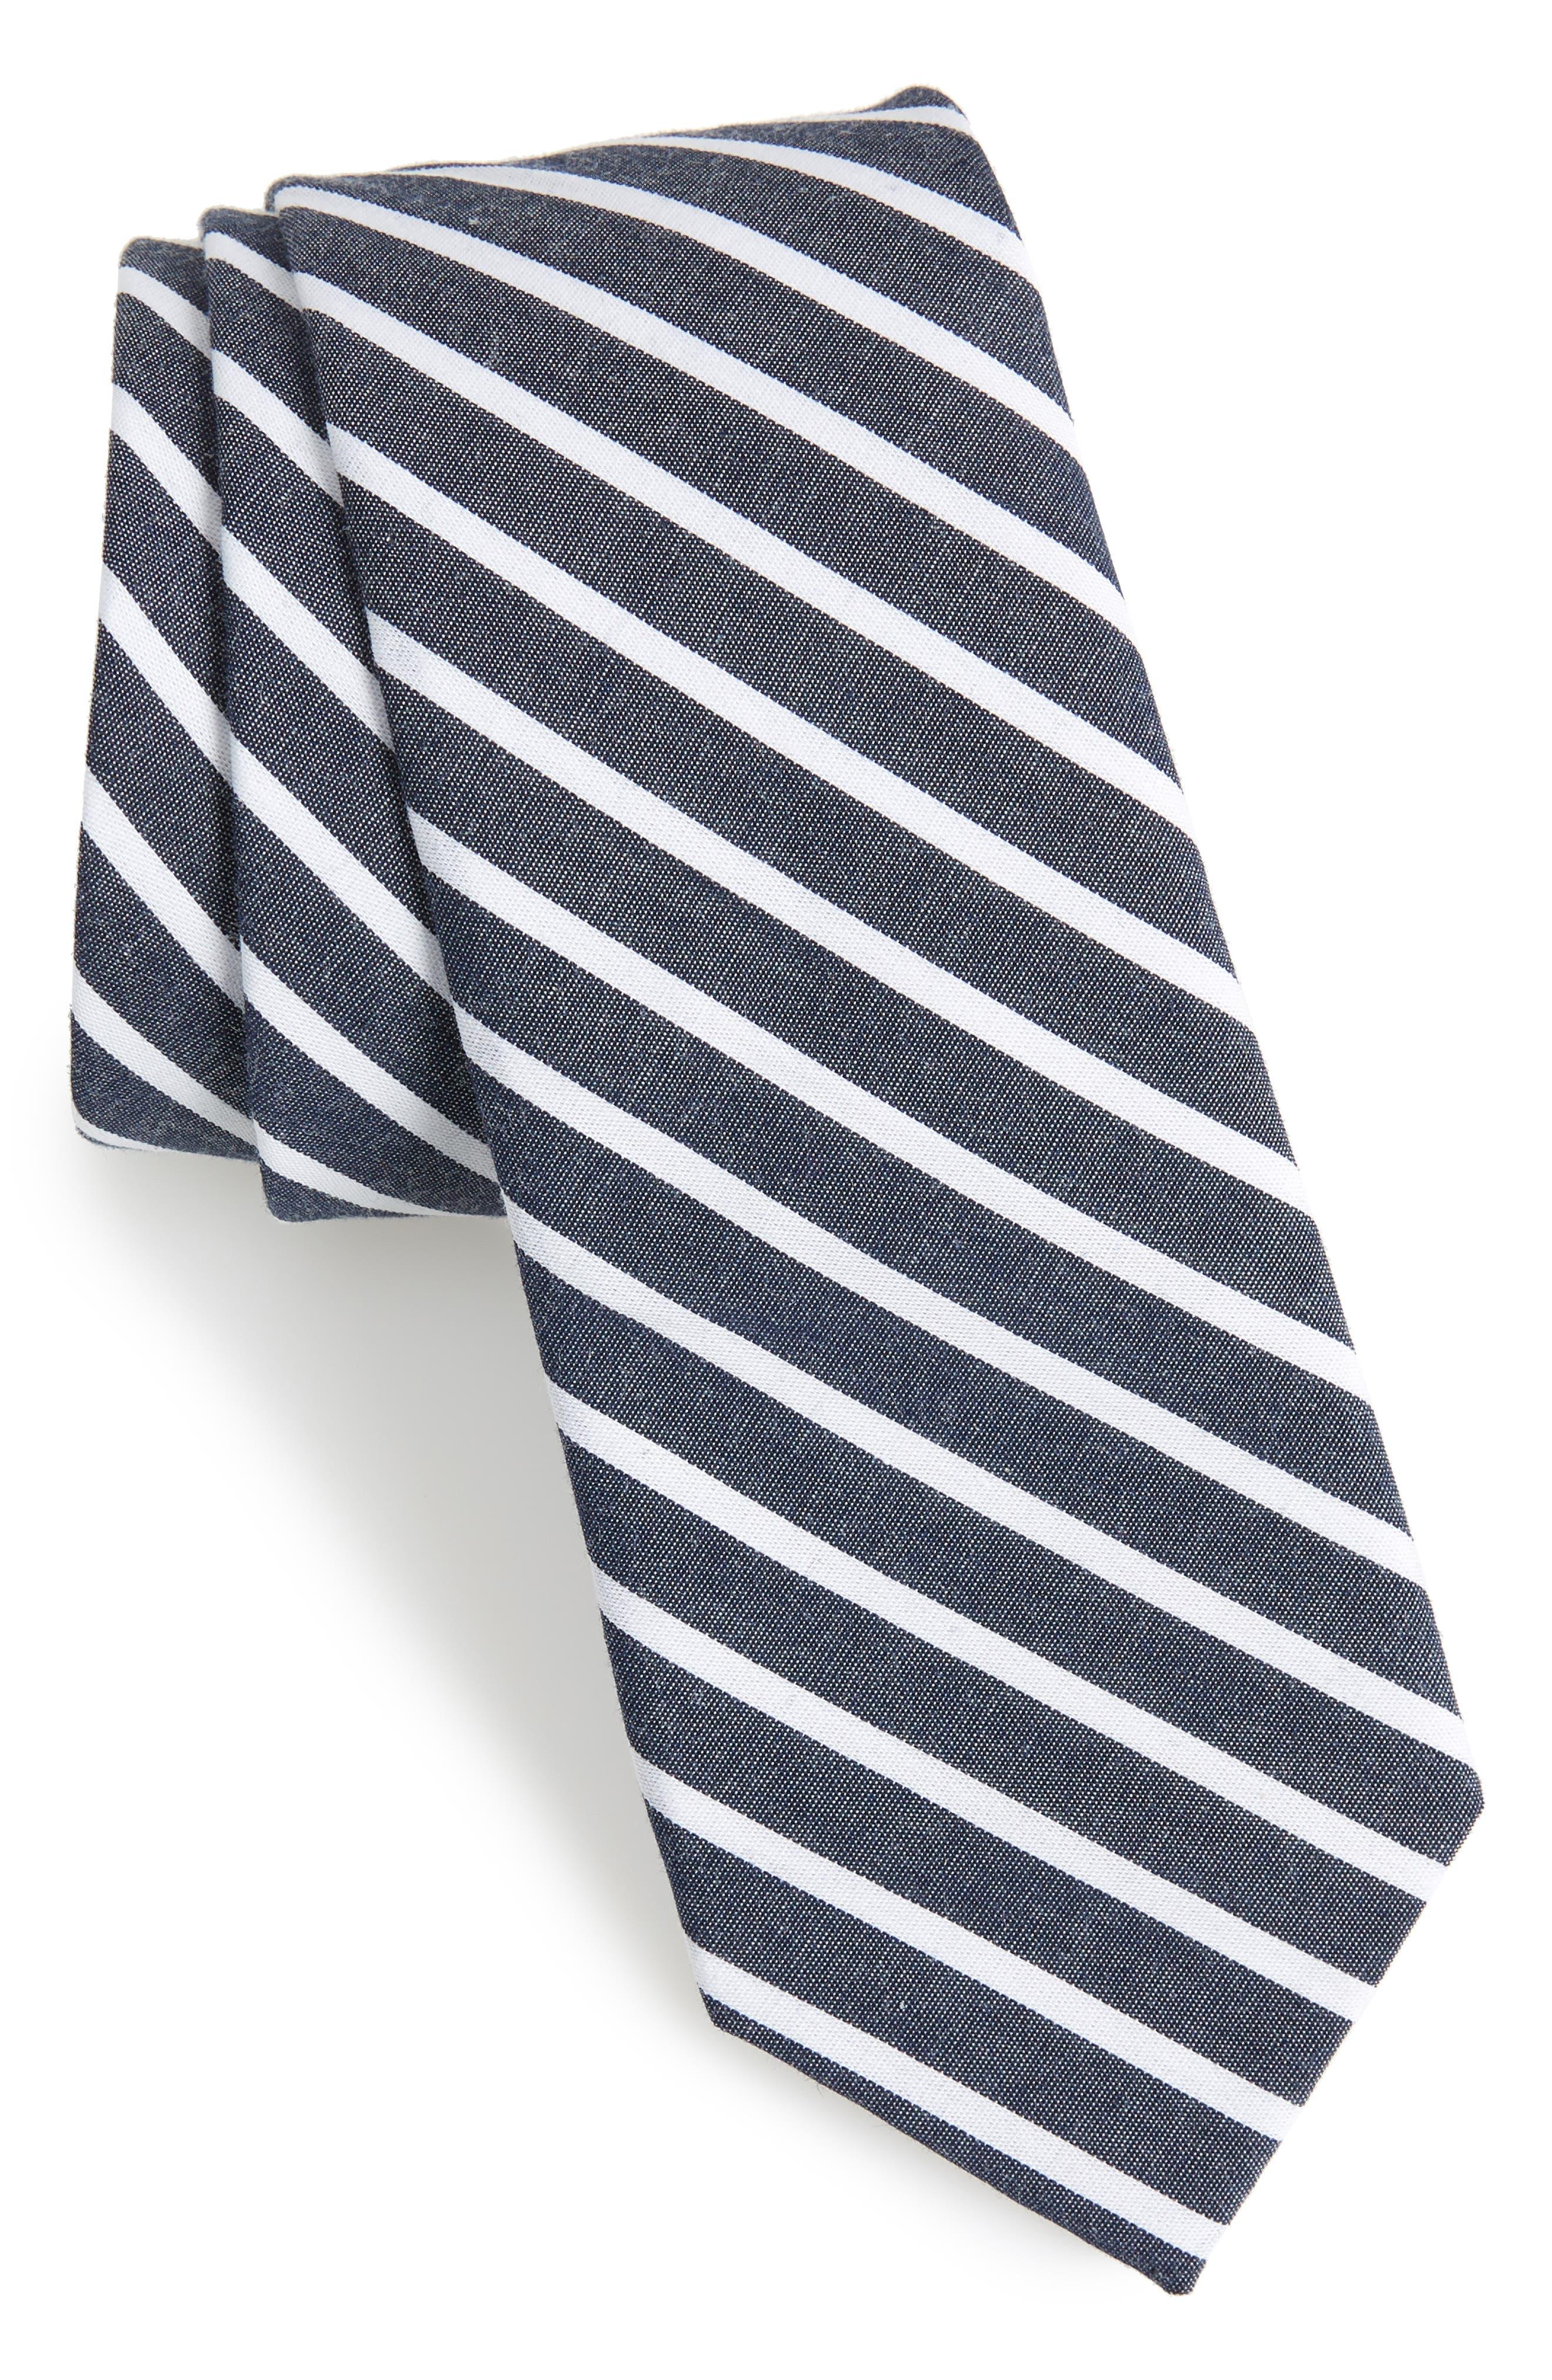 Holborn Stripe Cotton Skinny Tie,                             Main thumbnail 1, color,                             Navy